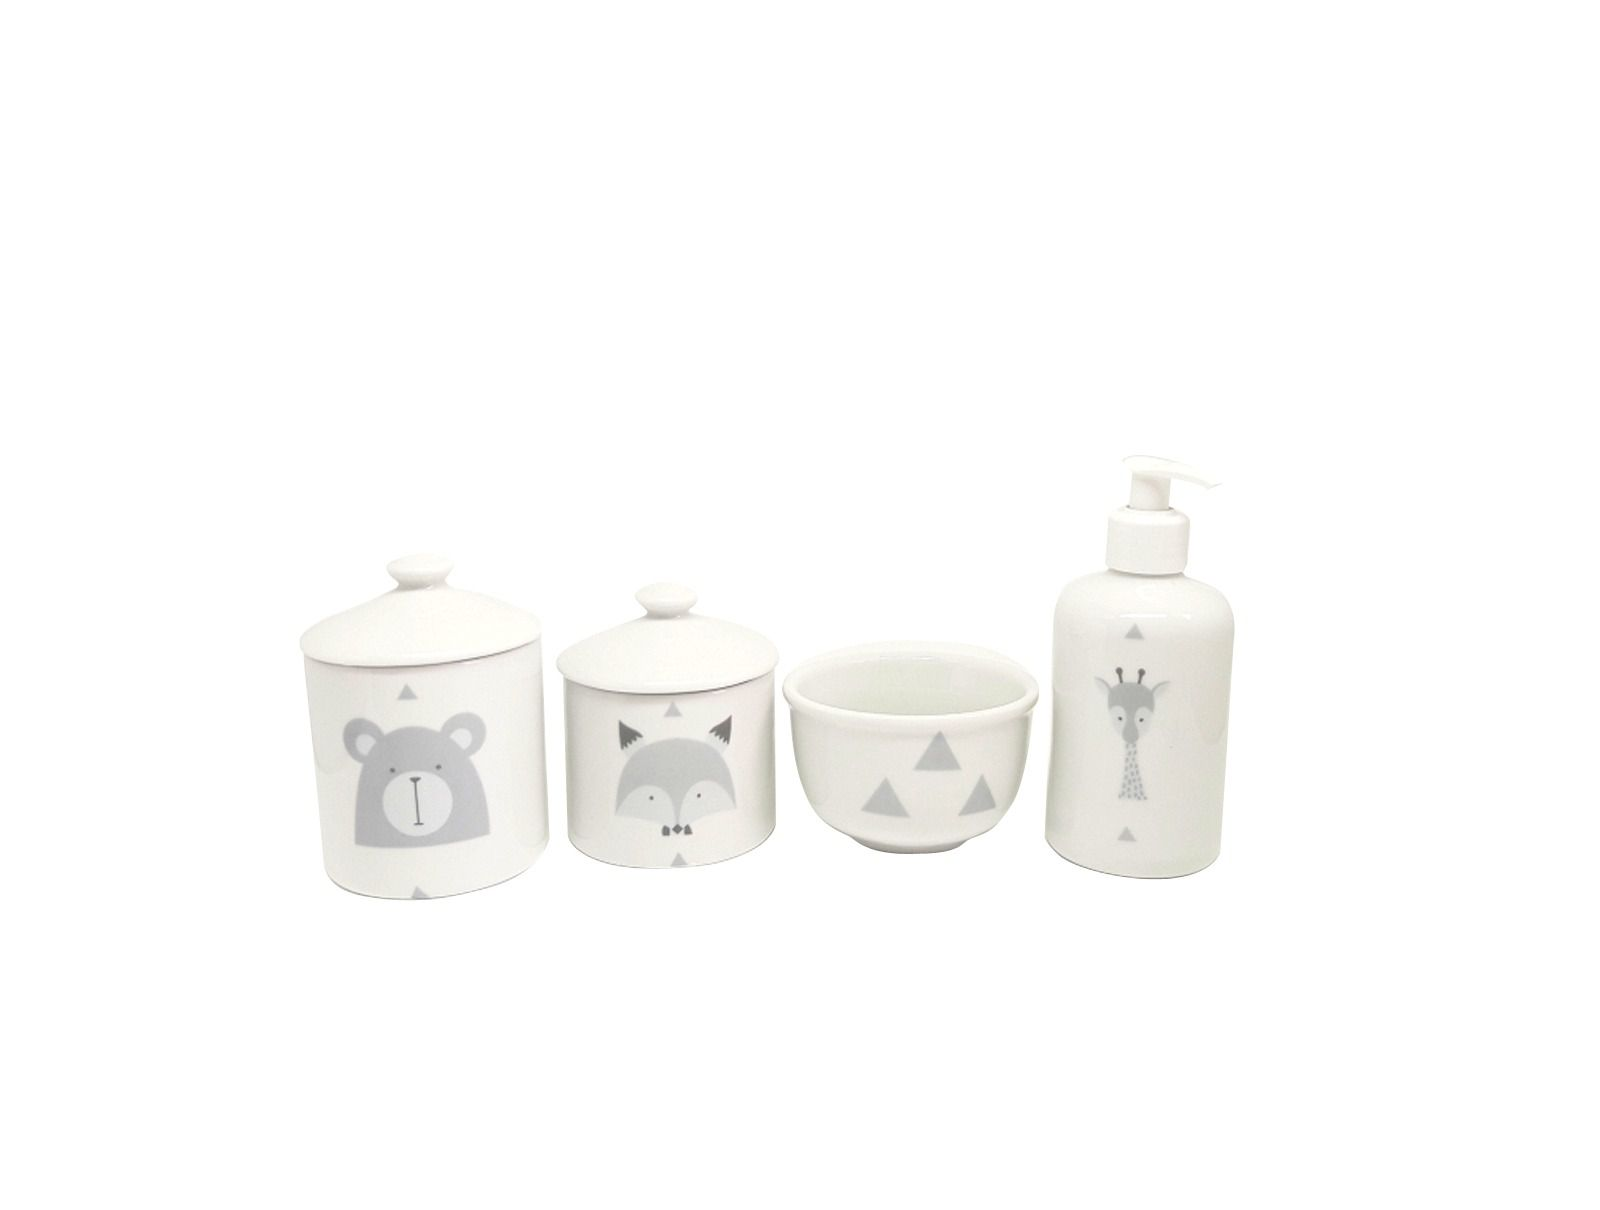 Kit Higiene Bebê Porcelana Escandinavo |Urso e Raposa & Girafa| 4 peças